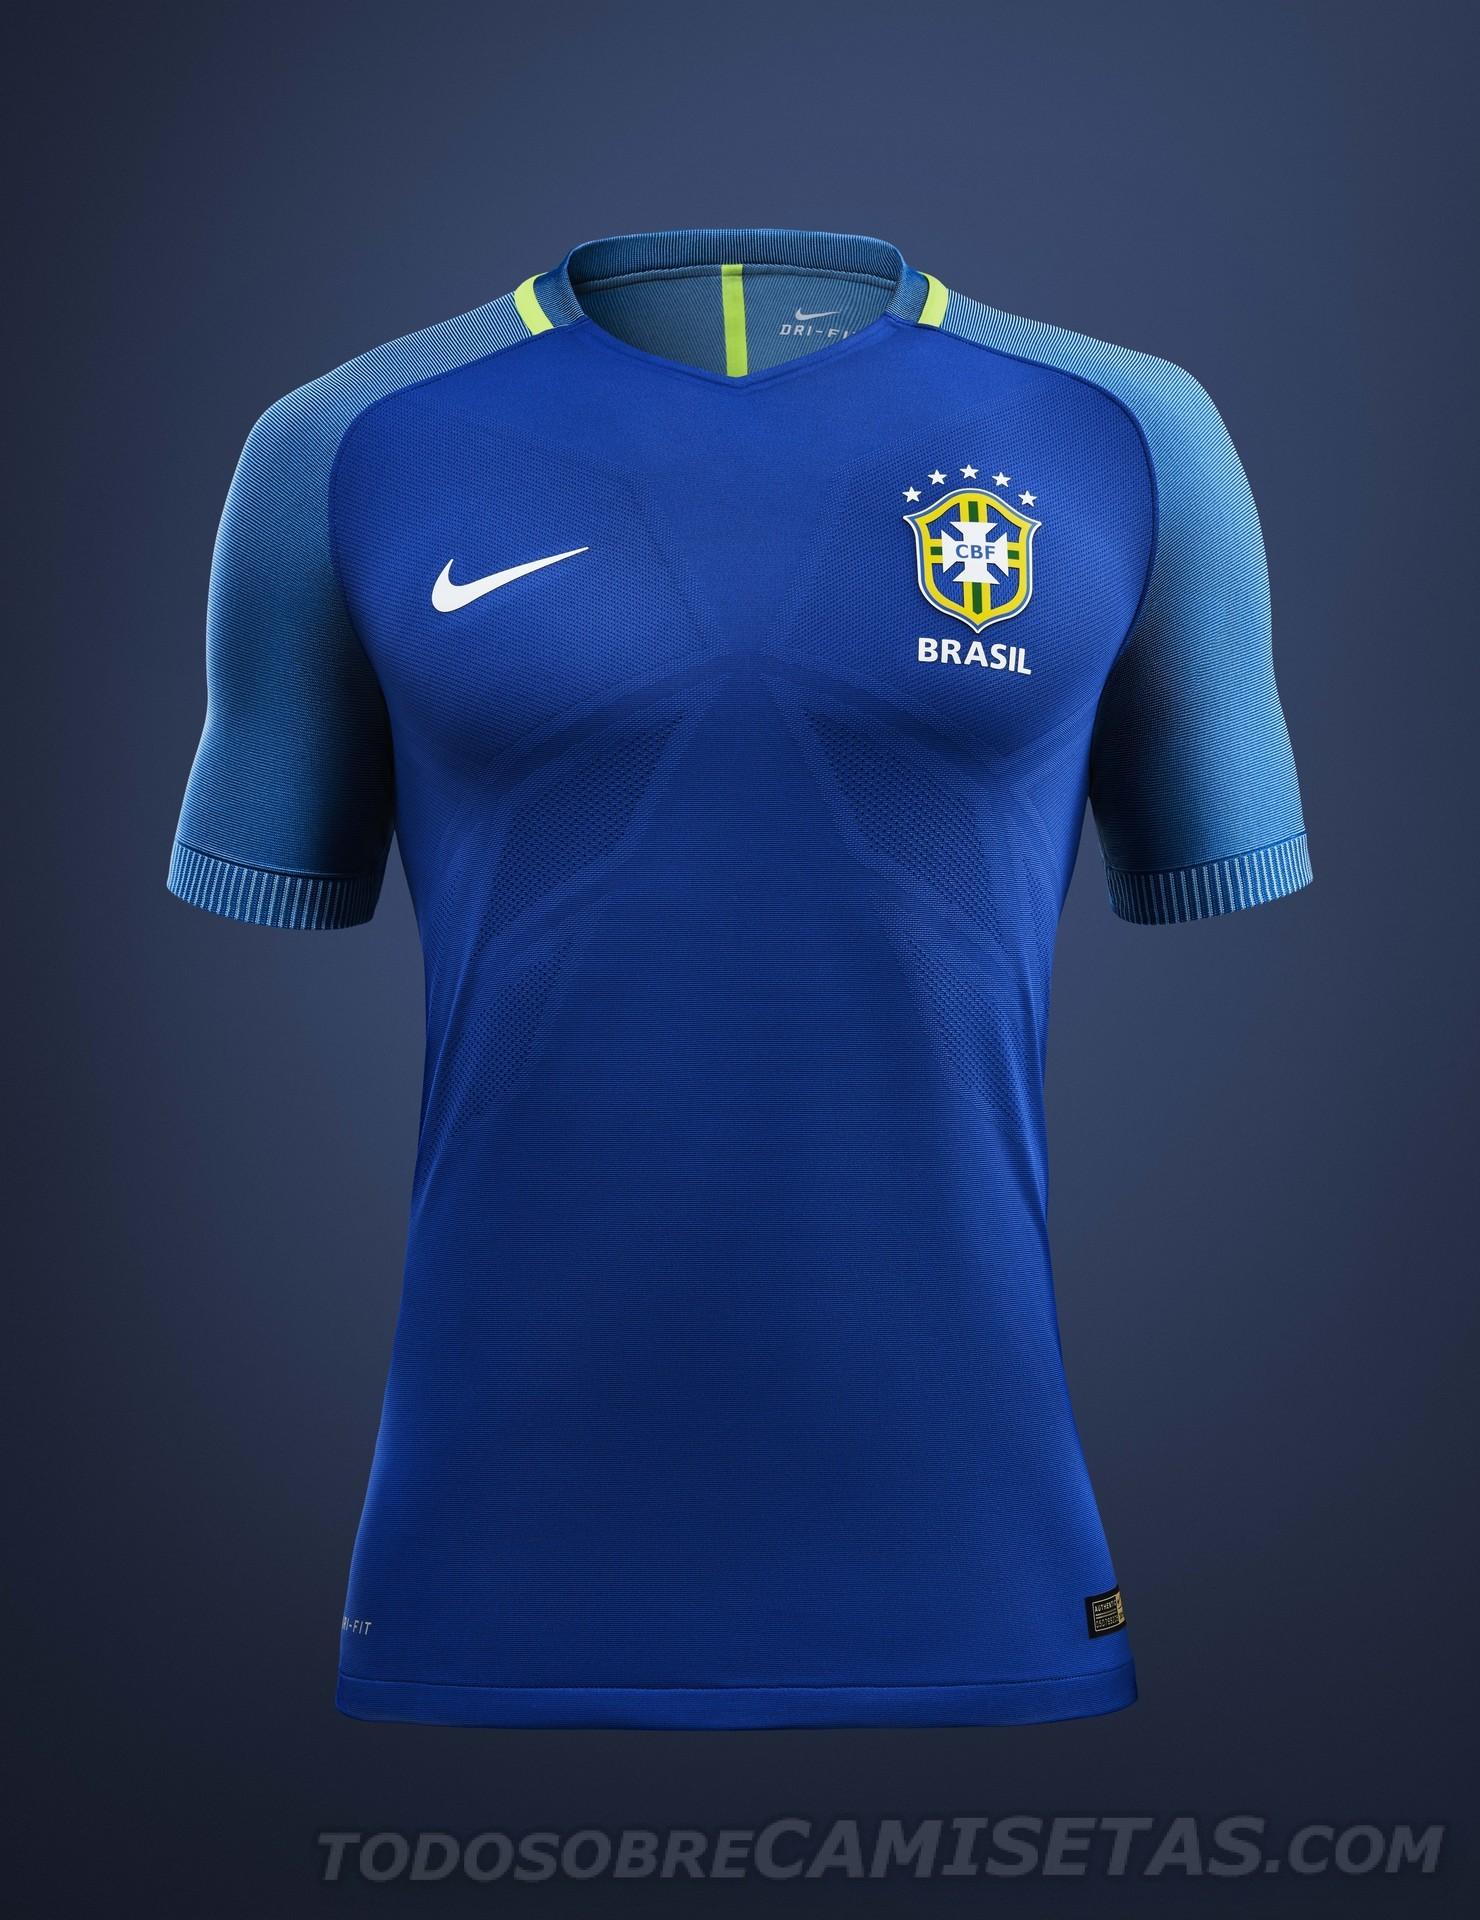 Brazil-2016-NIKE-new-away-kit-1.jpg